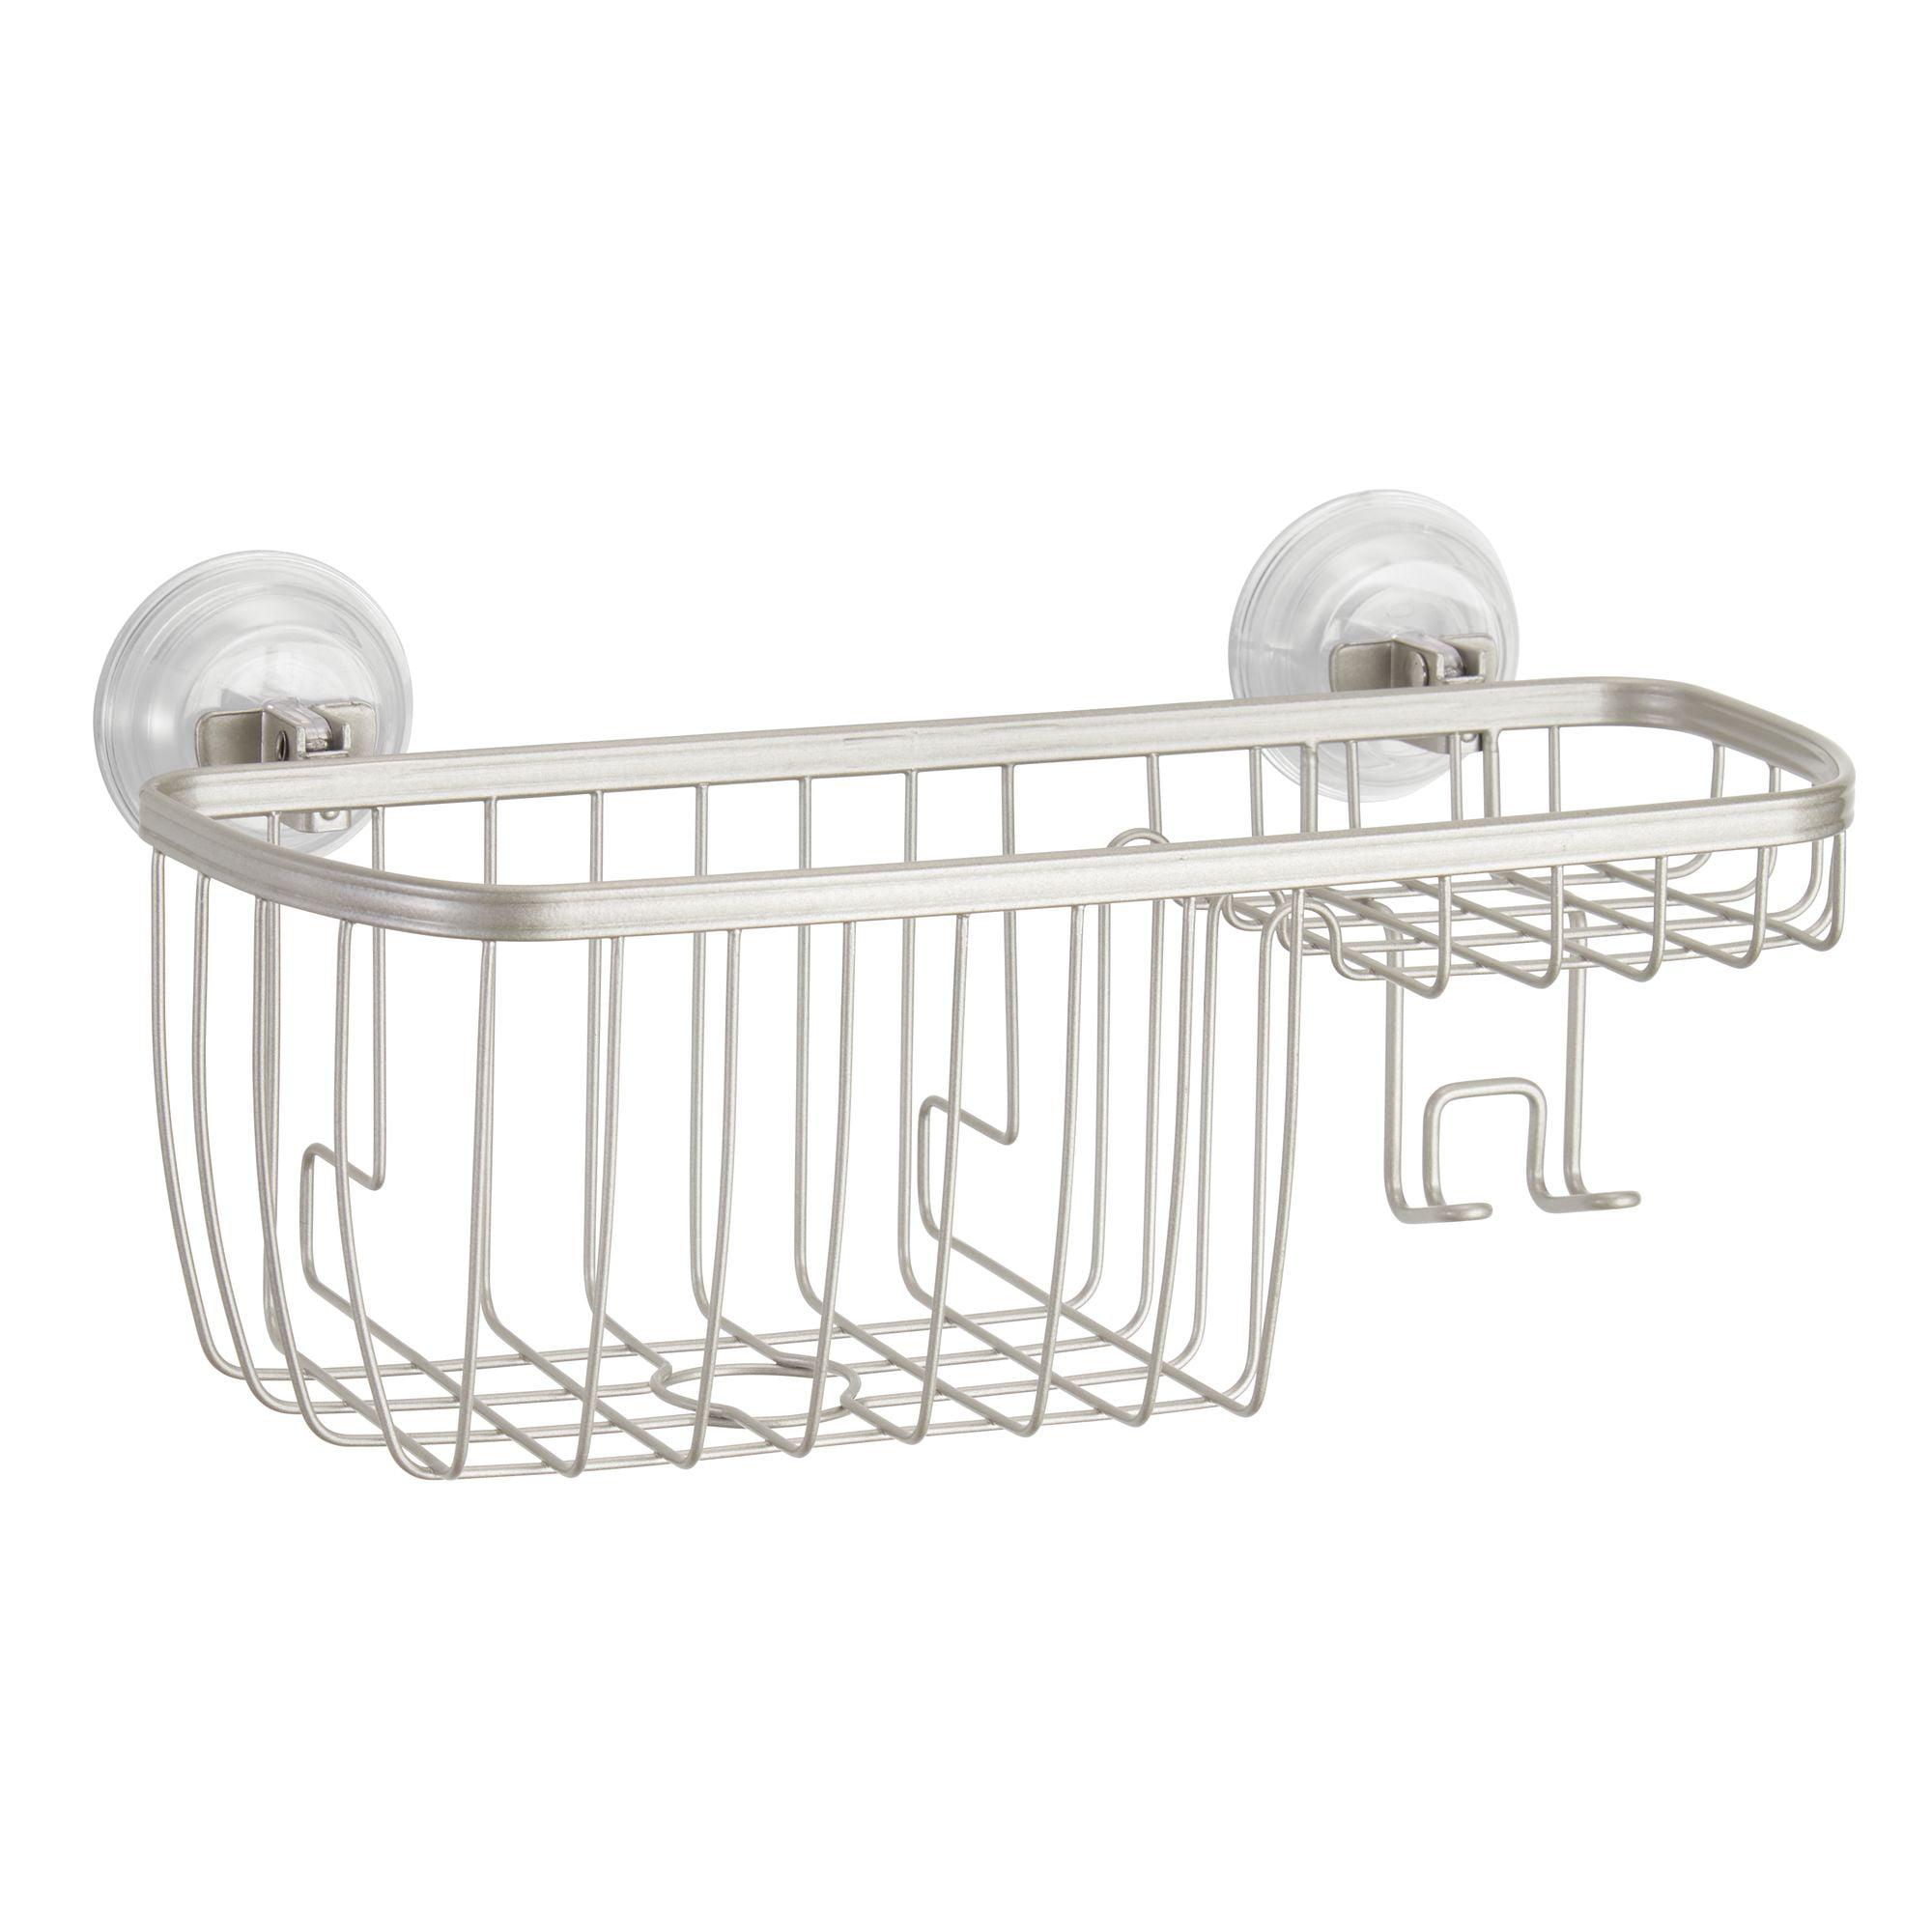 Better Homes & Gardens Satin Suction Shower Basket